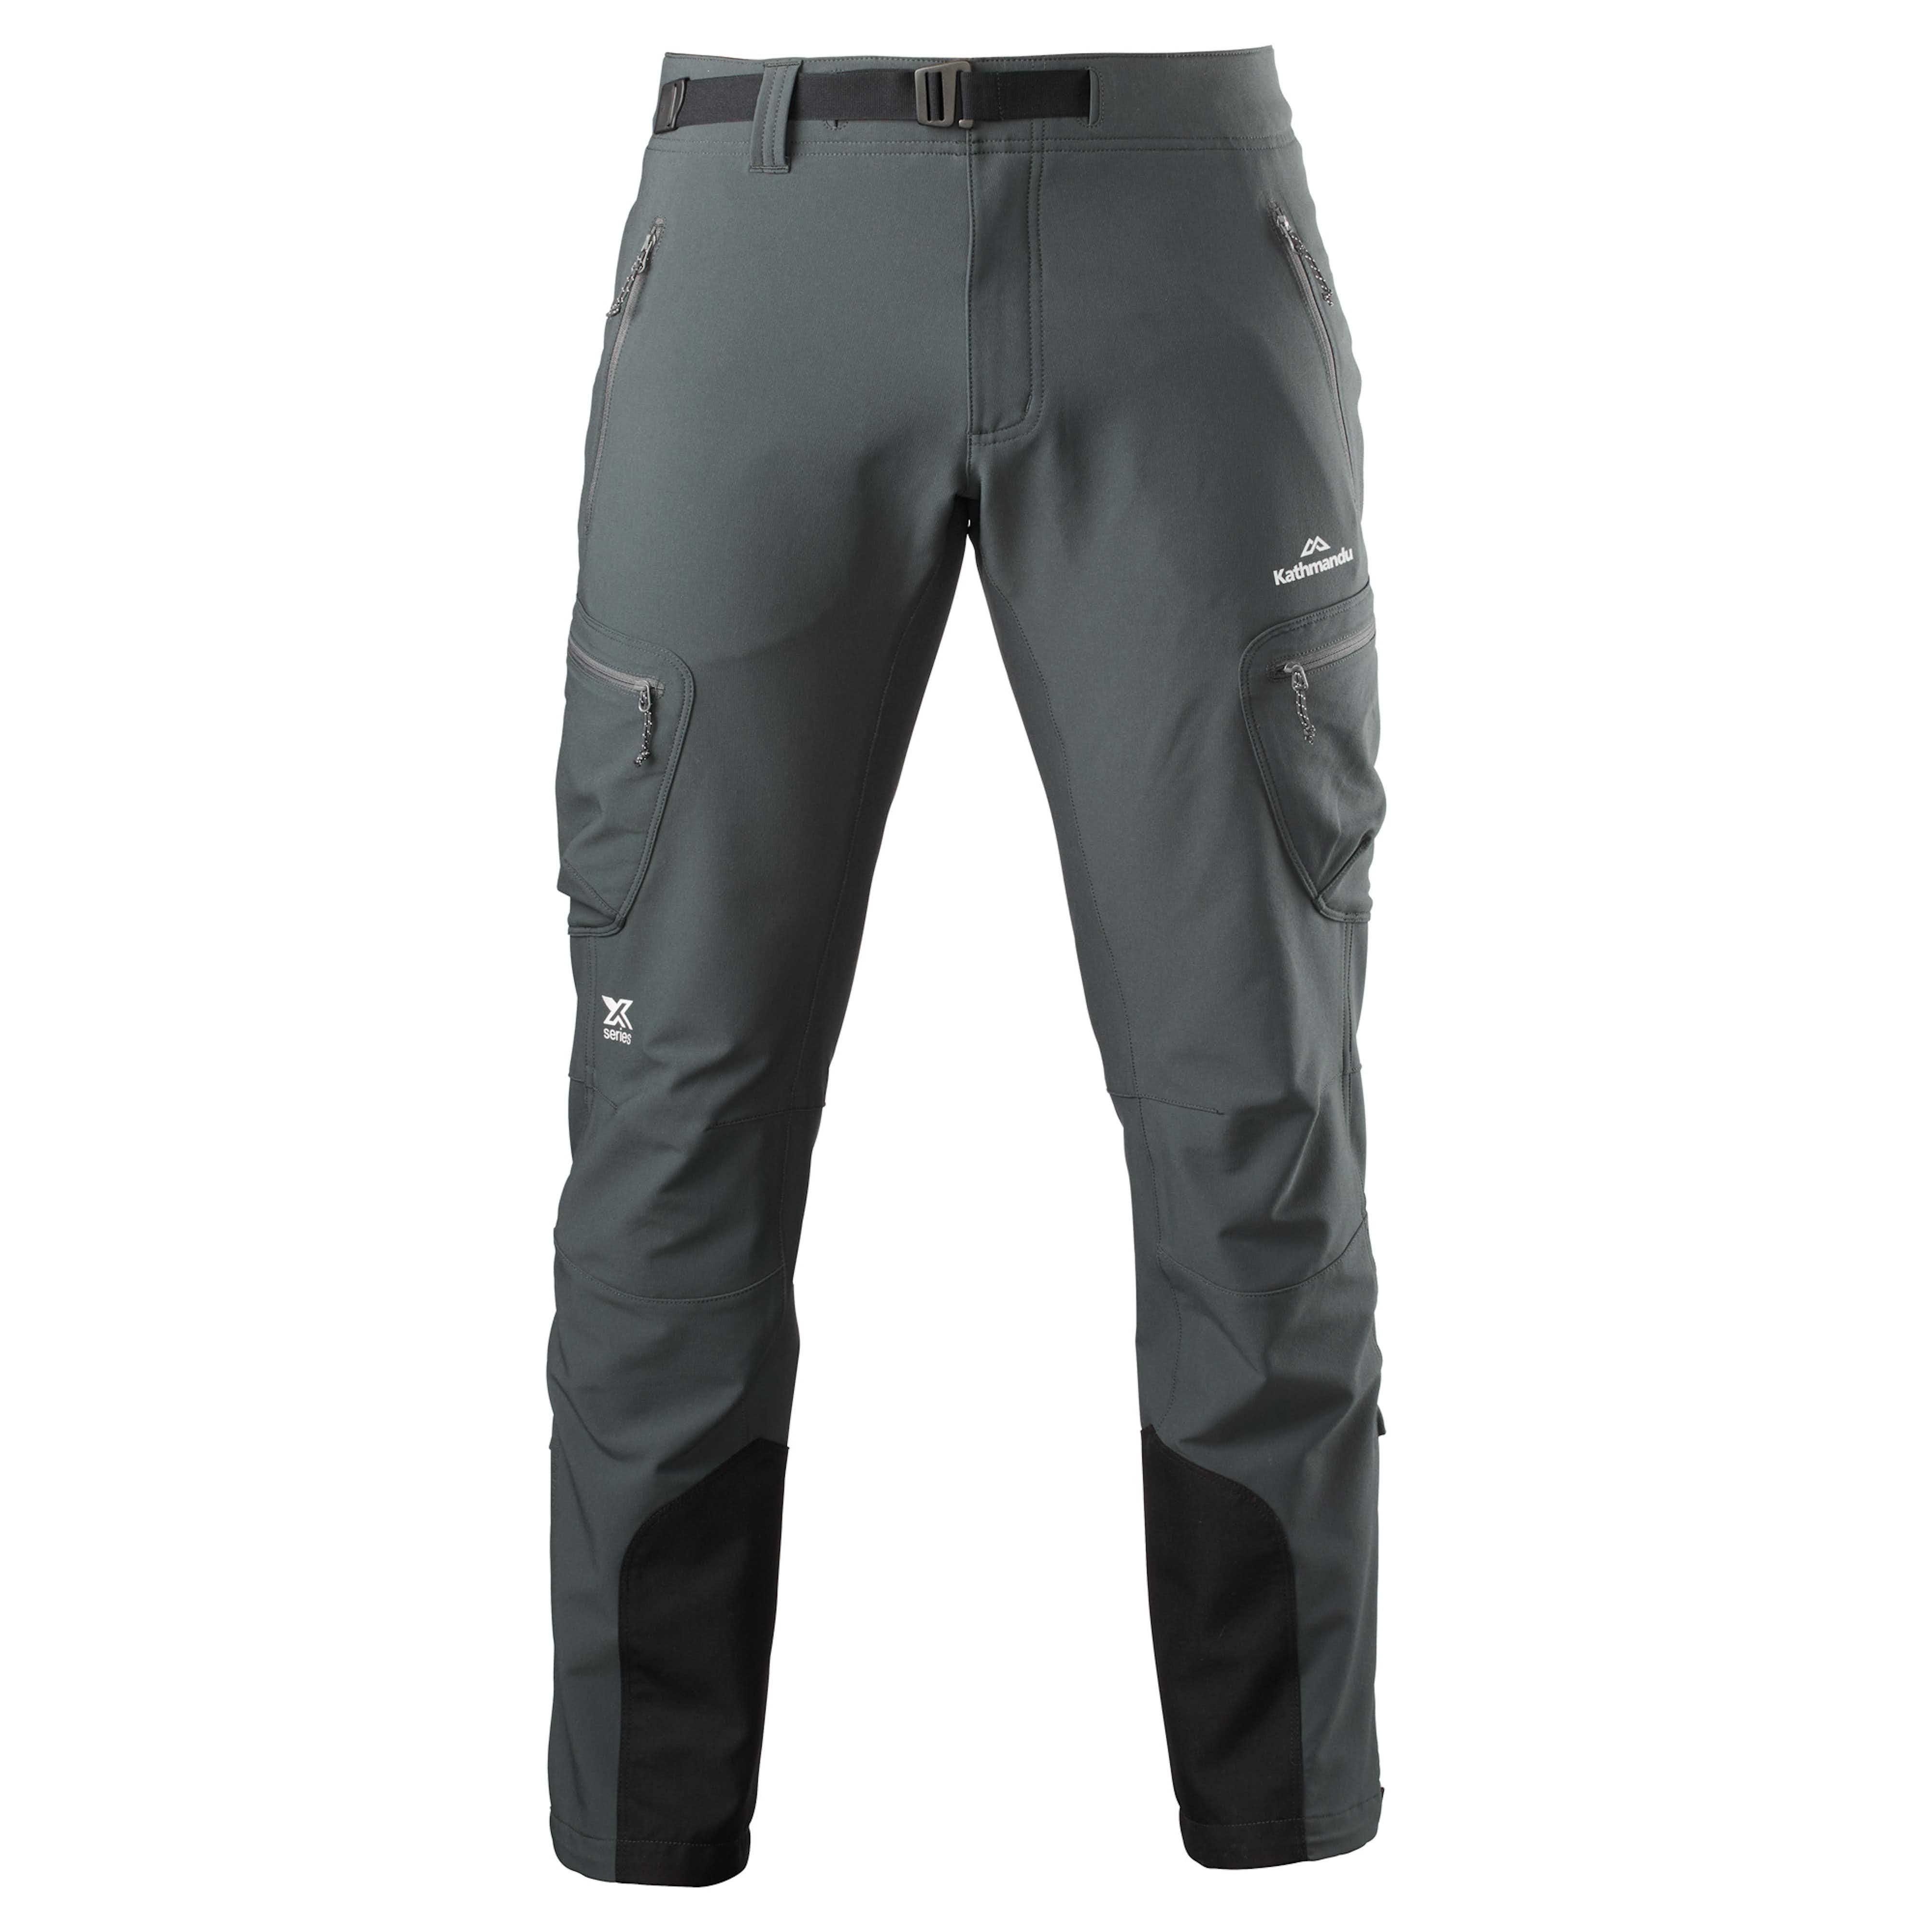 670223a6349d XT Verso Men s Hiking Pants XT Verso Men s Hiking Pants